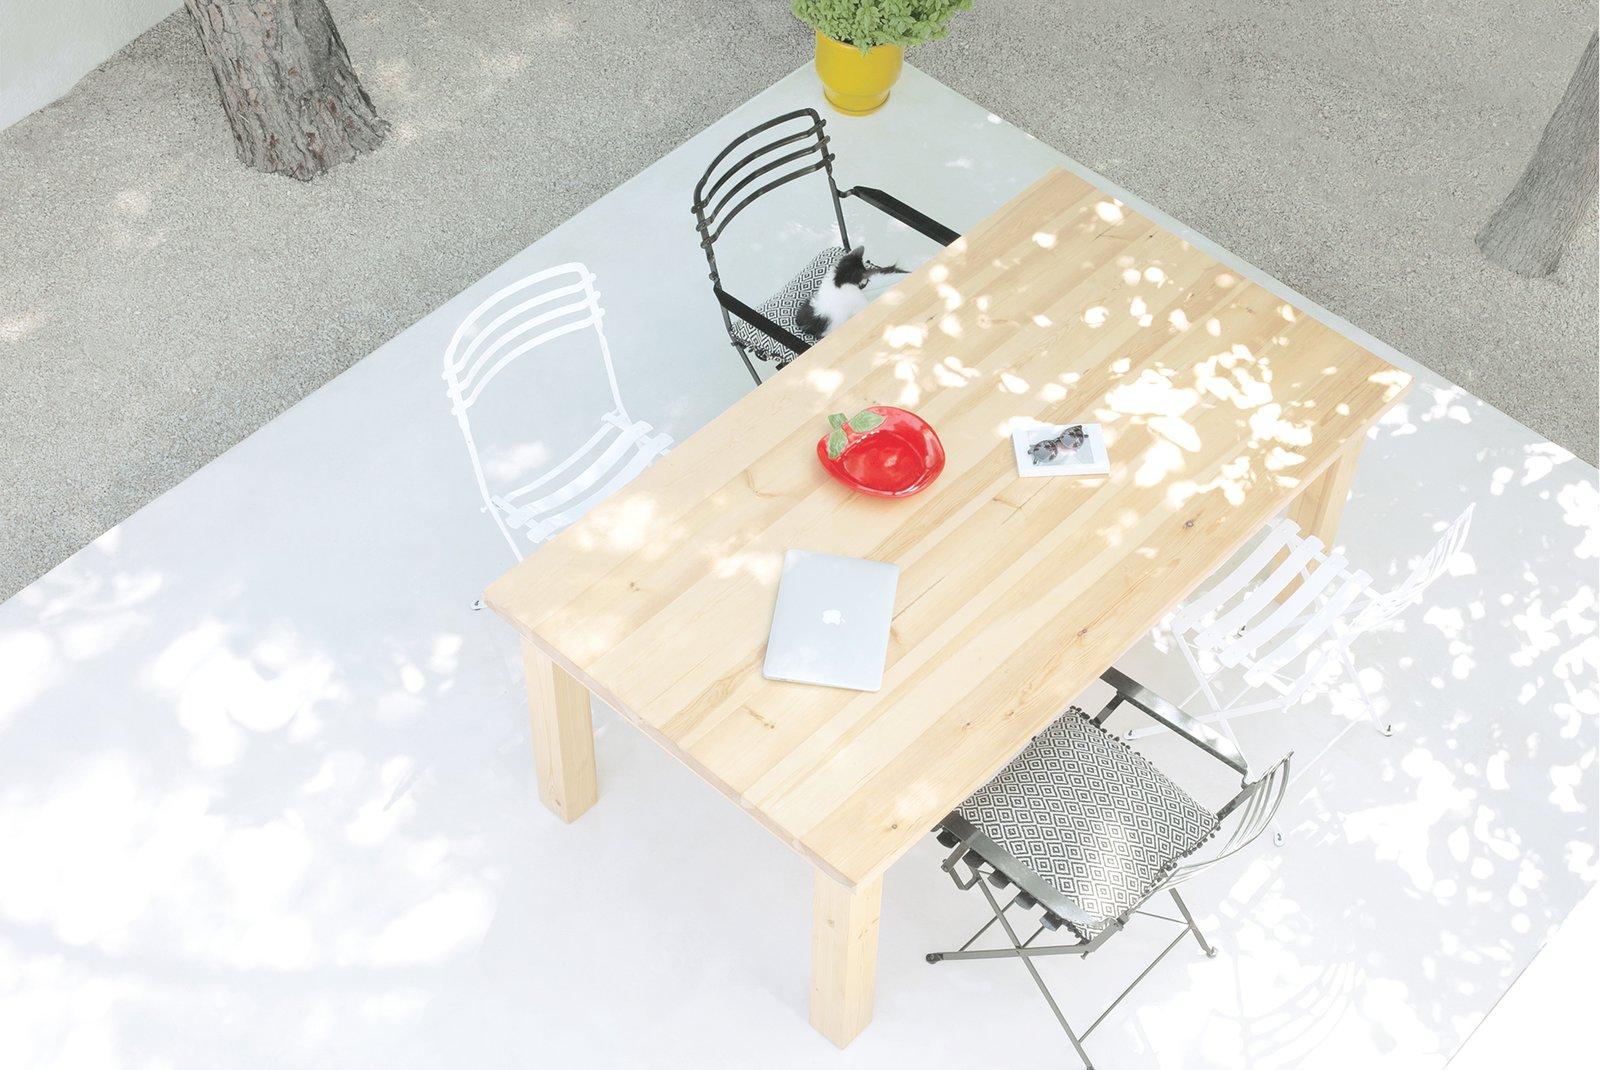 A patio enables guests to dine al fresco.